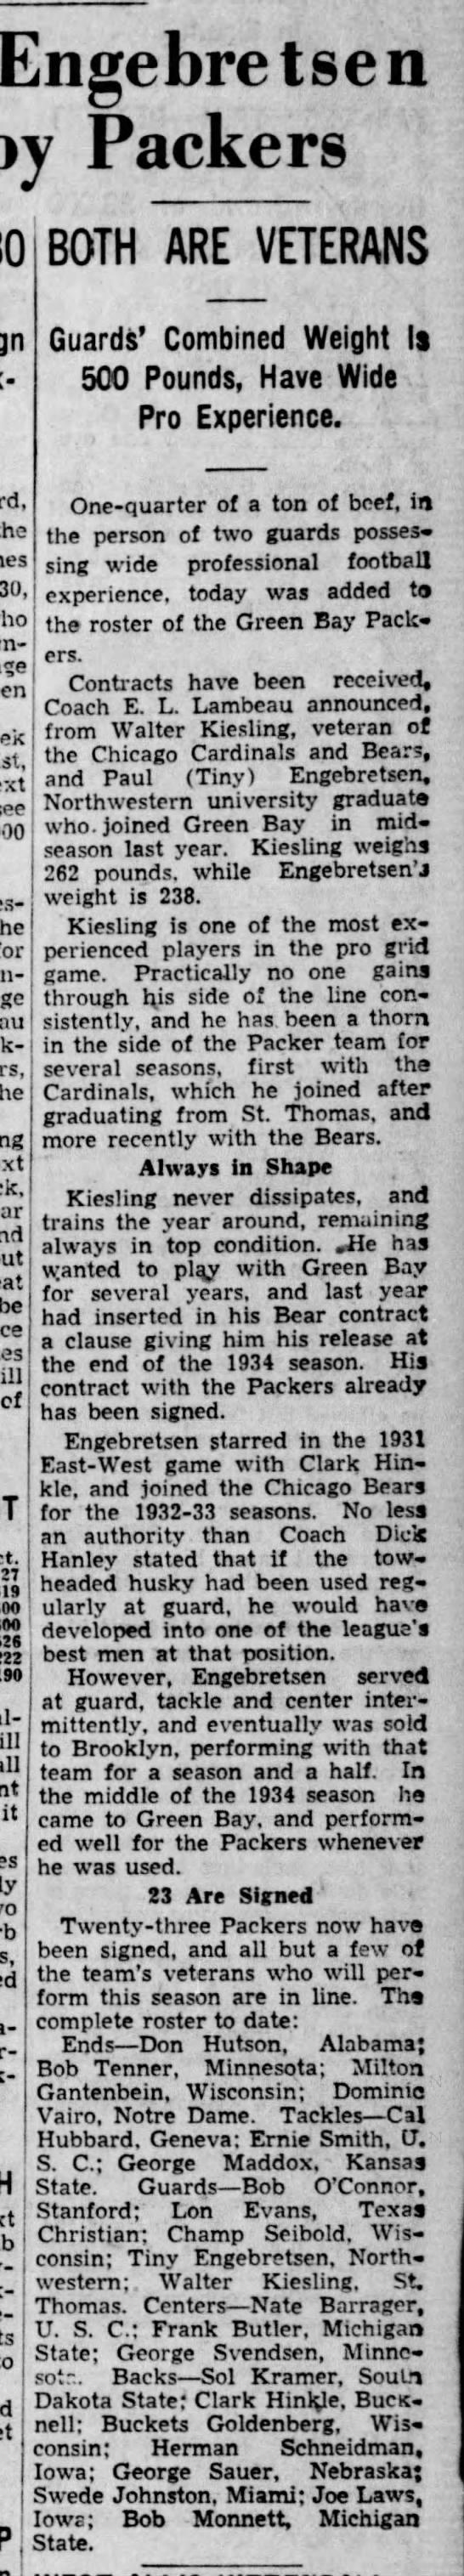 Kiesling, Engbretsen Signed by Packers -